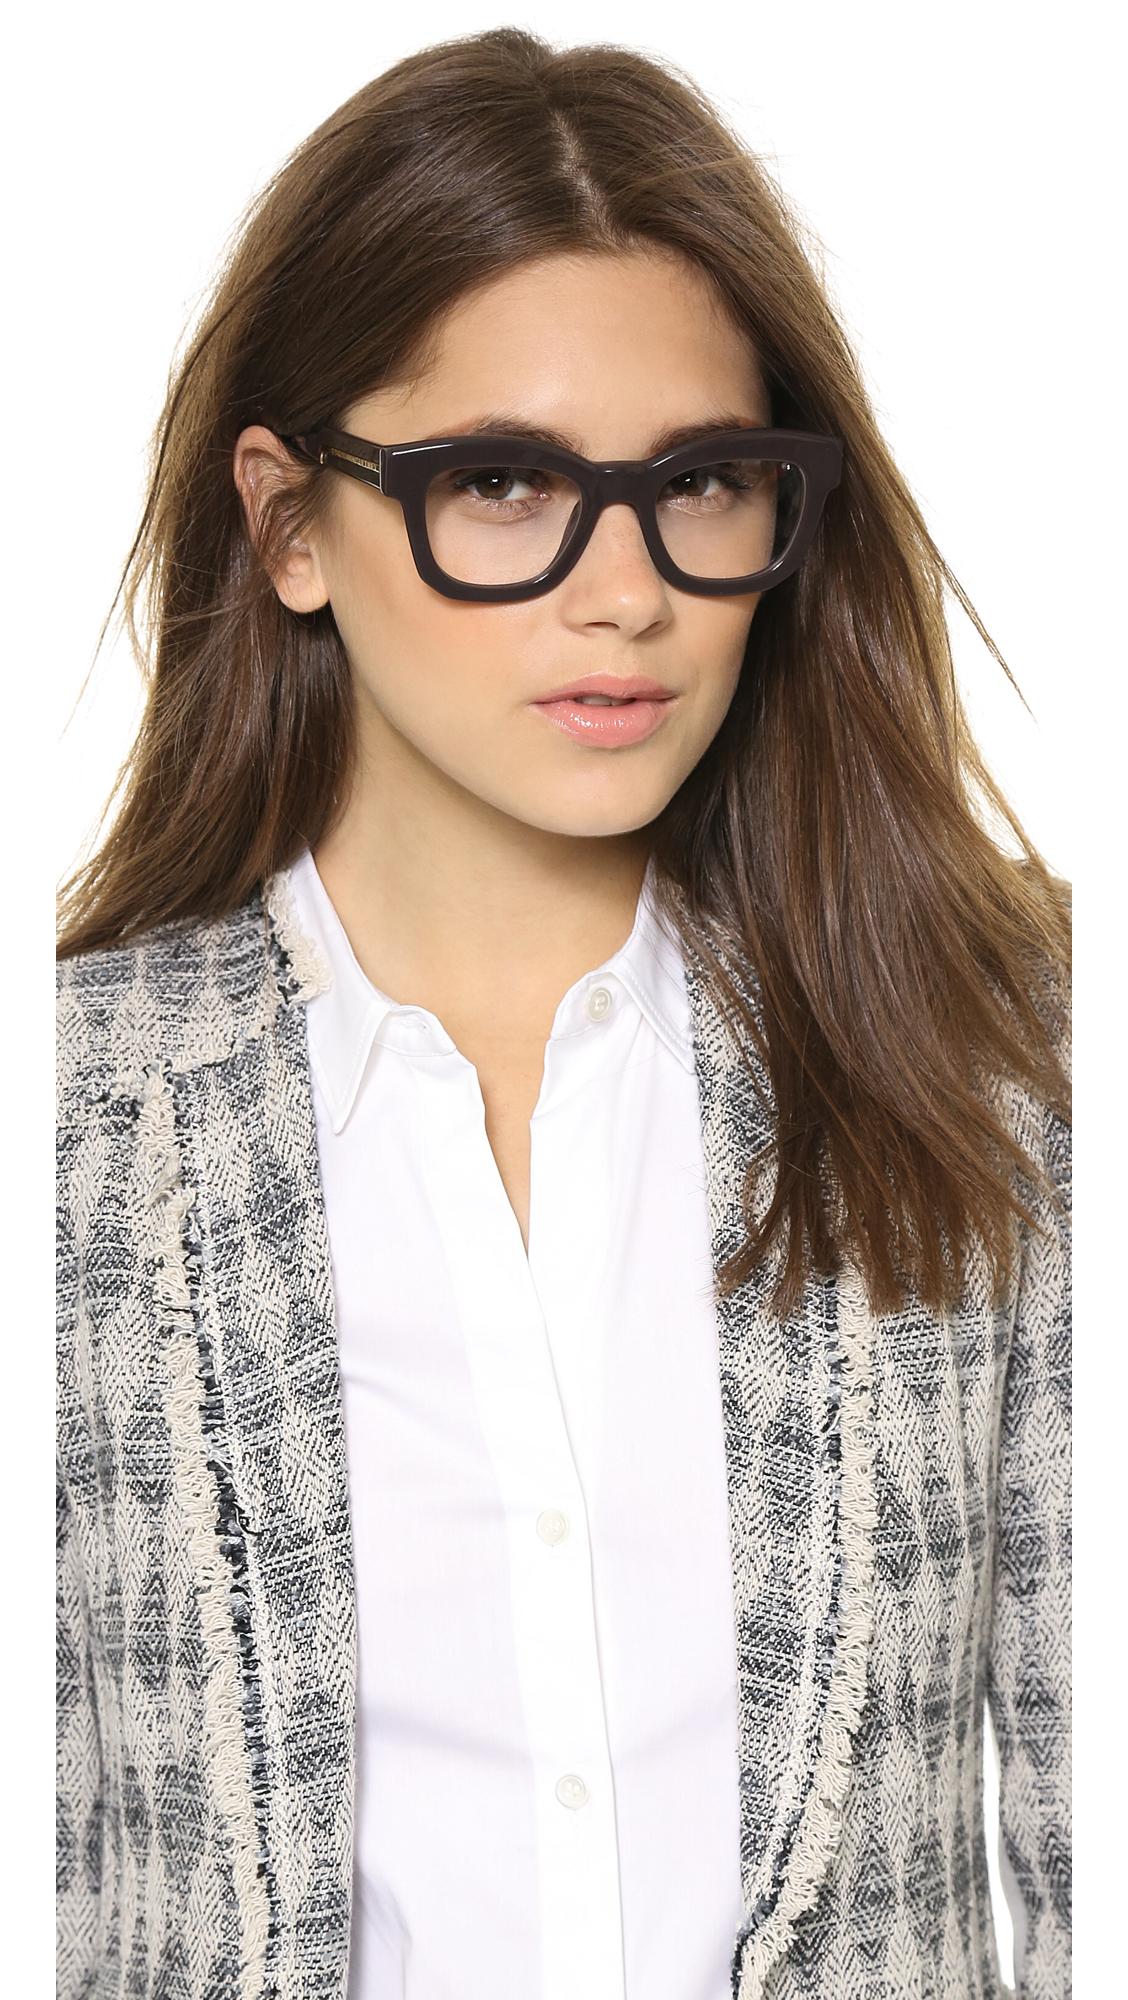 cd7e4ddd97 Stella McCartney Thick Frame Glasses